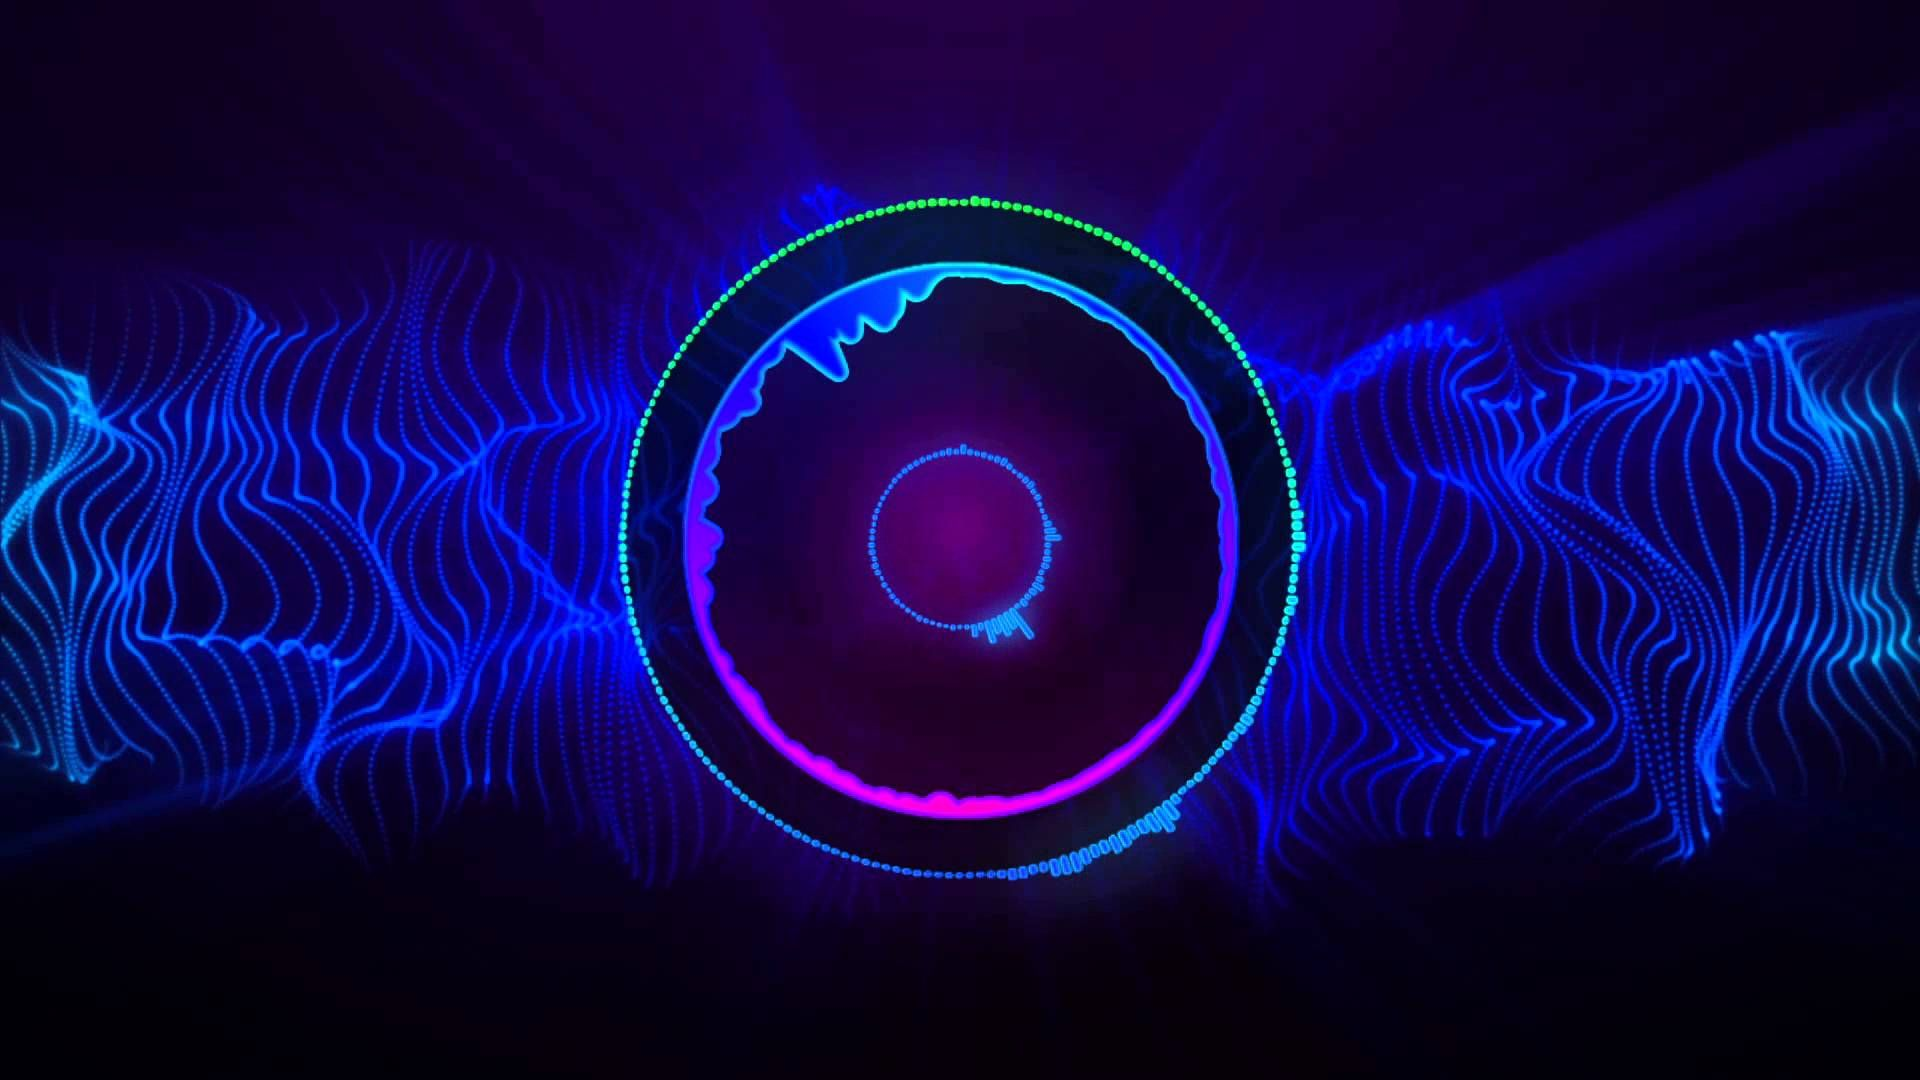 Music Spectrum Wallpaper HD Resolution music spectrum